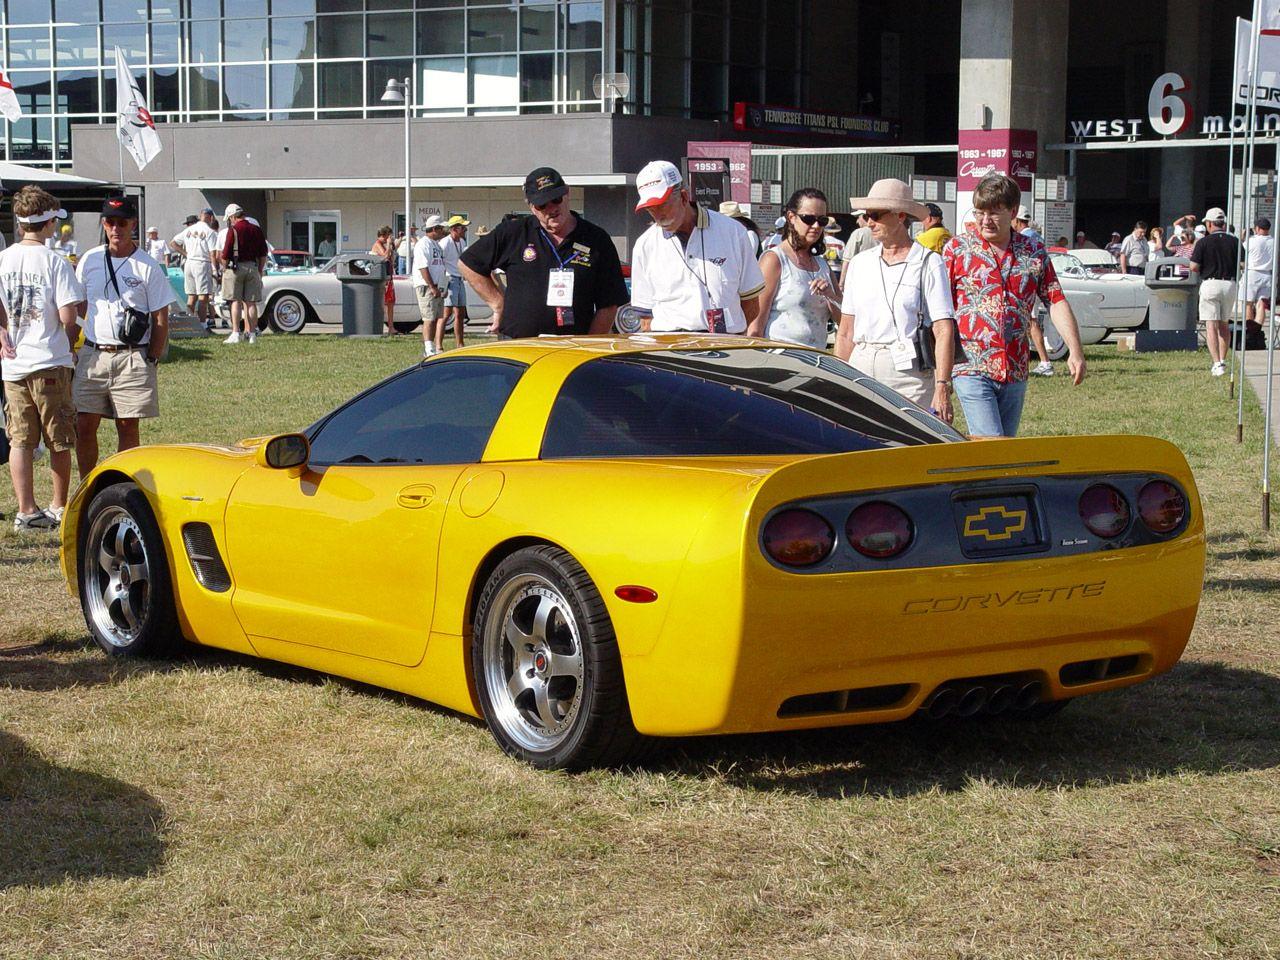 Corvette C5 Tiger Shark Concept Corvette Corvette America Corvette C5